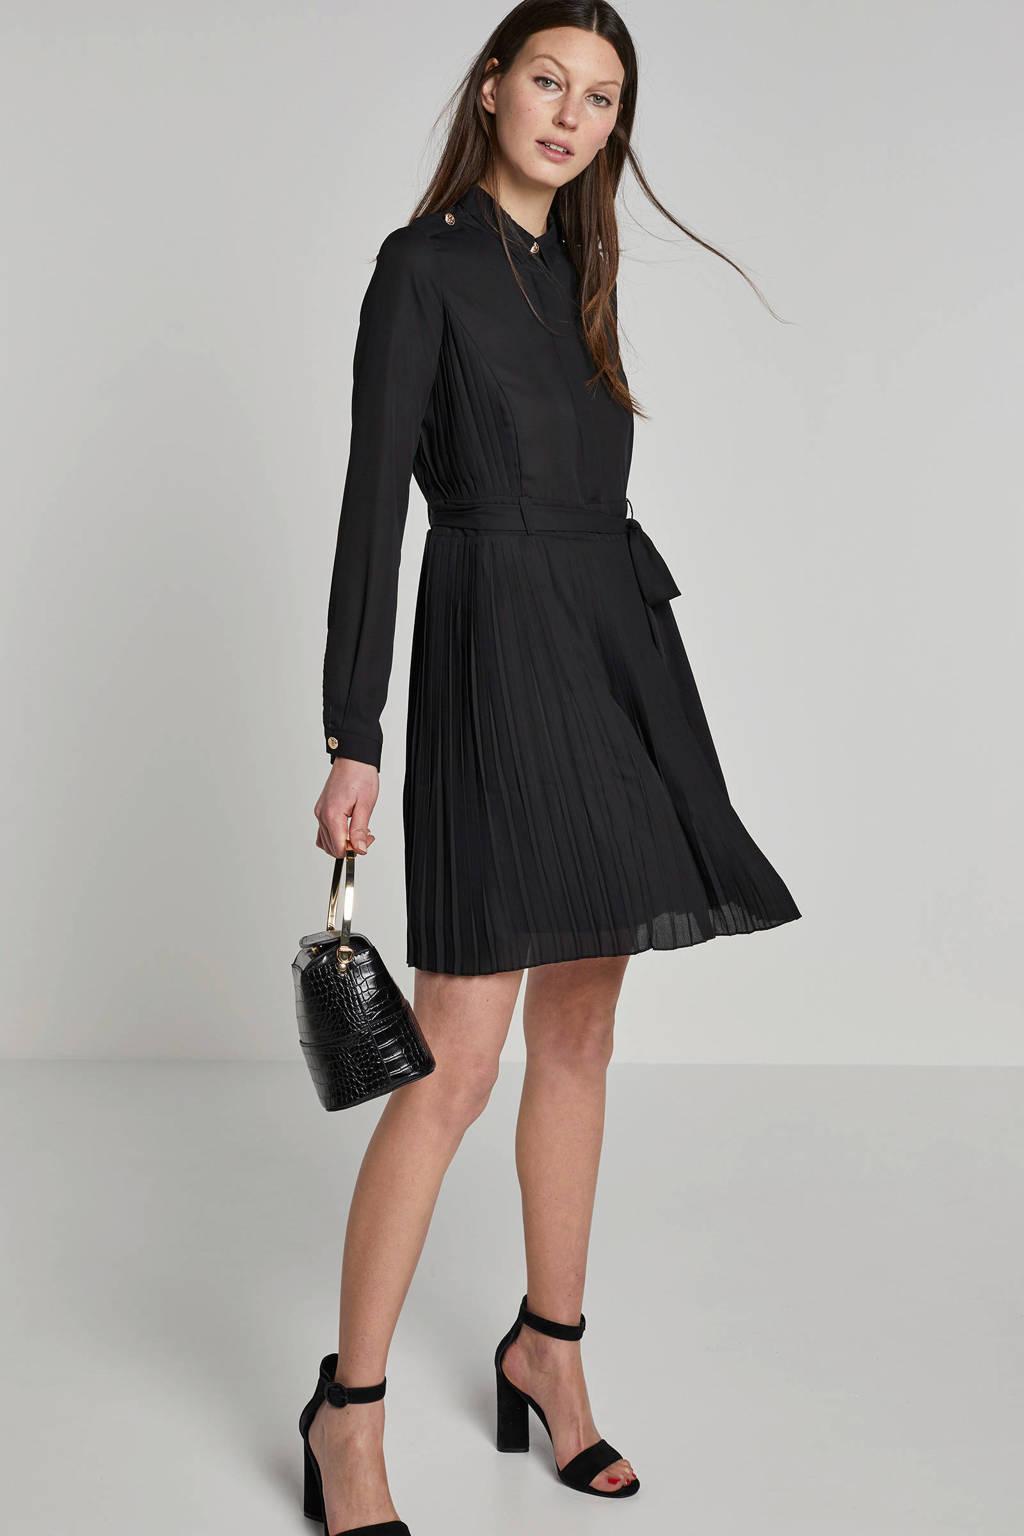 JOSH V jurk met plissé, Zwart